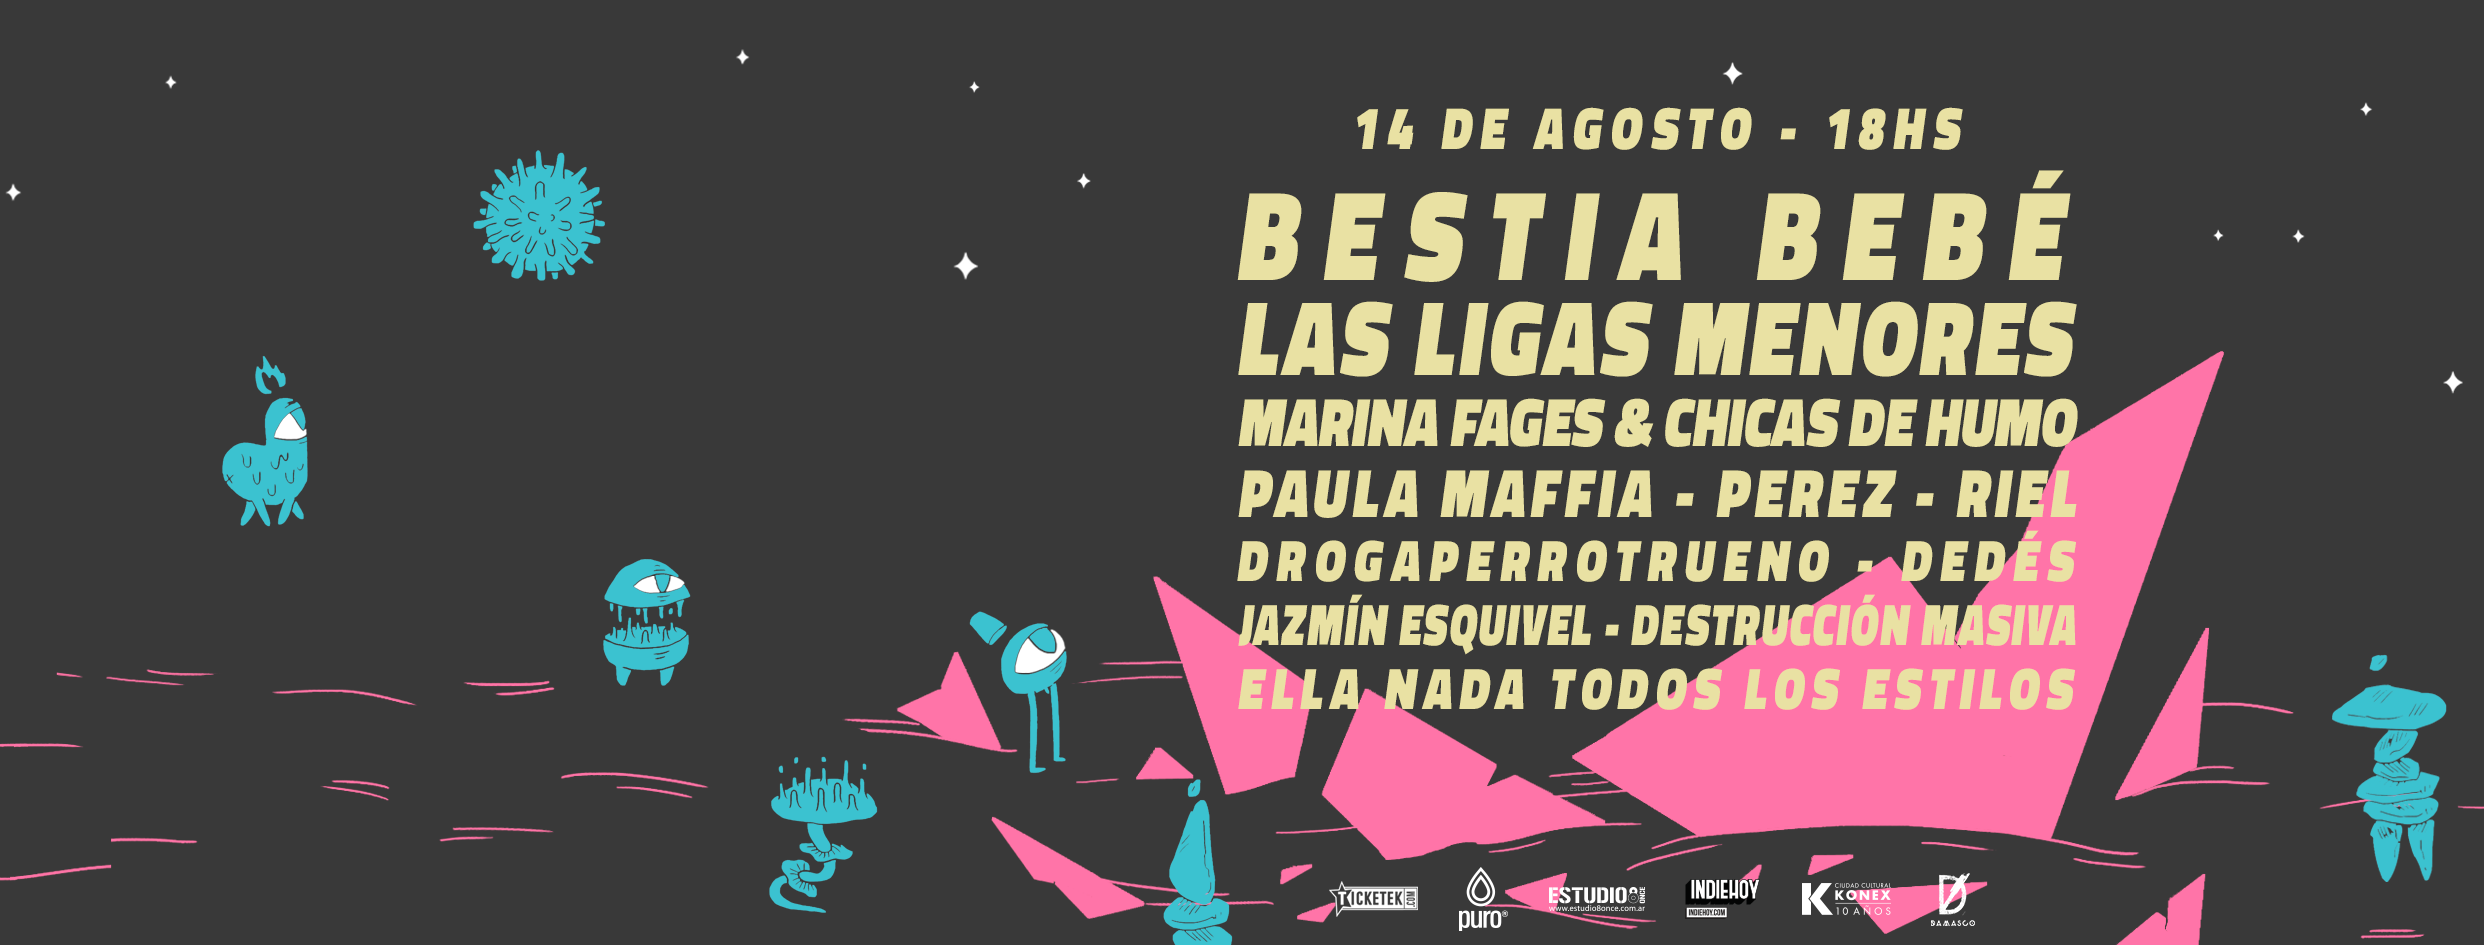 festival ahora